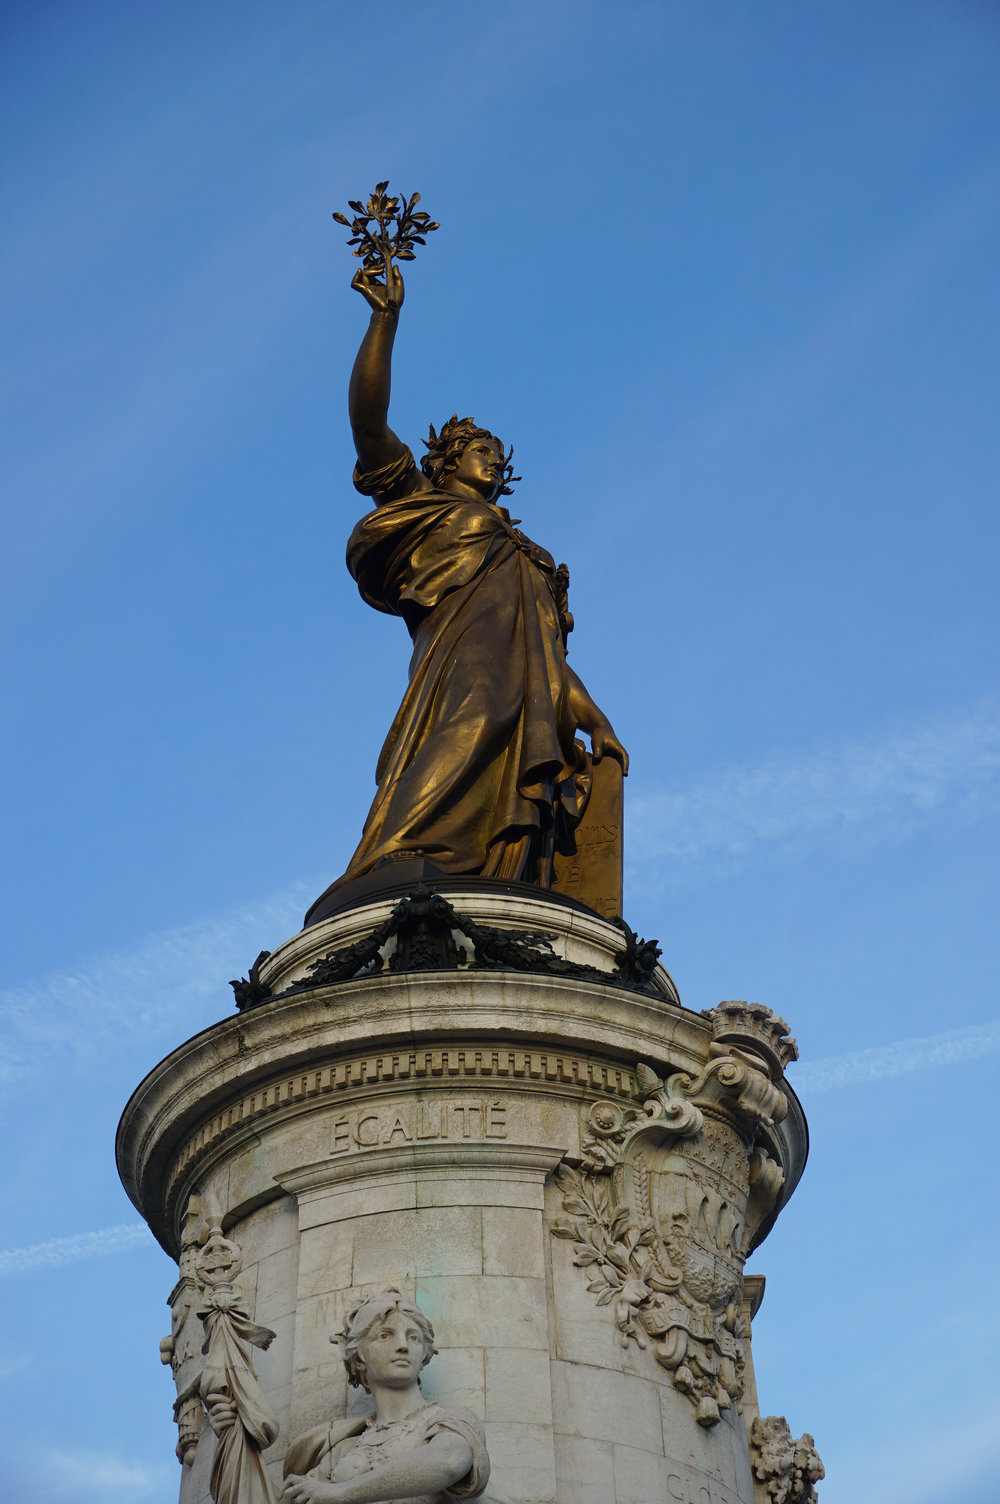 Pace de la Republique Statue in the 10th